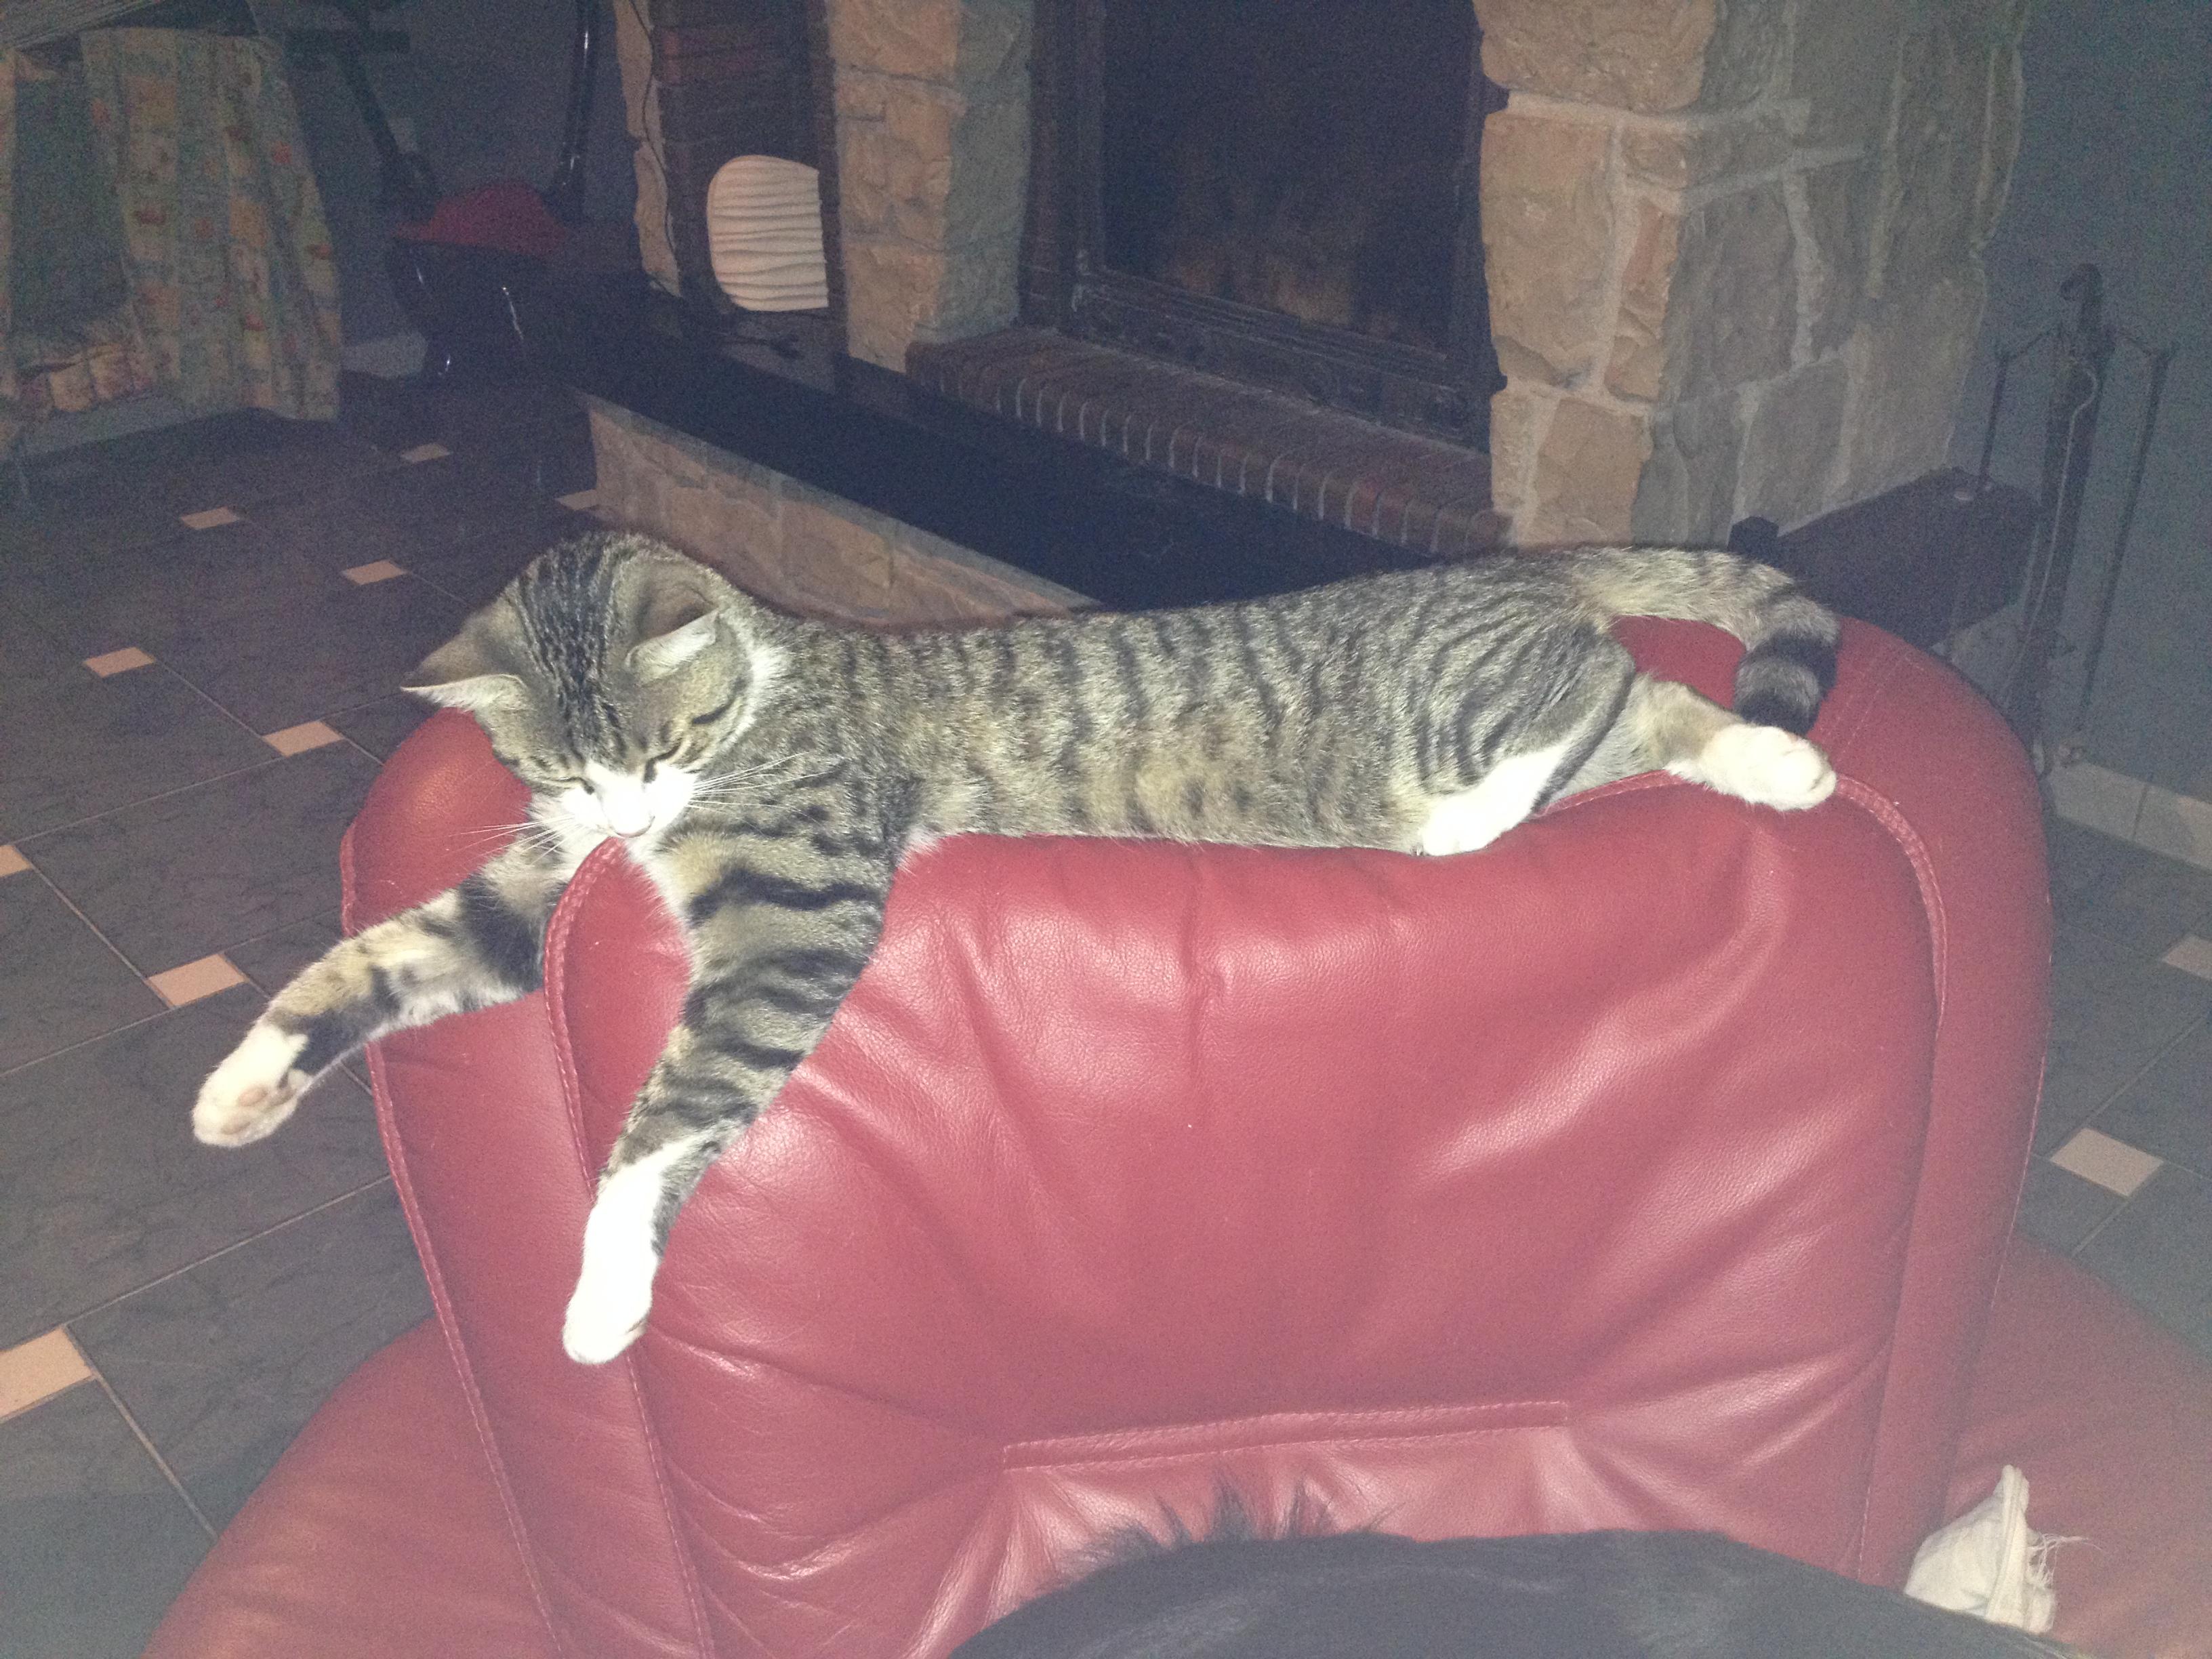 Tagada, un chat qui a besoin d'être